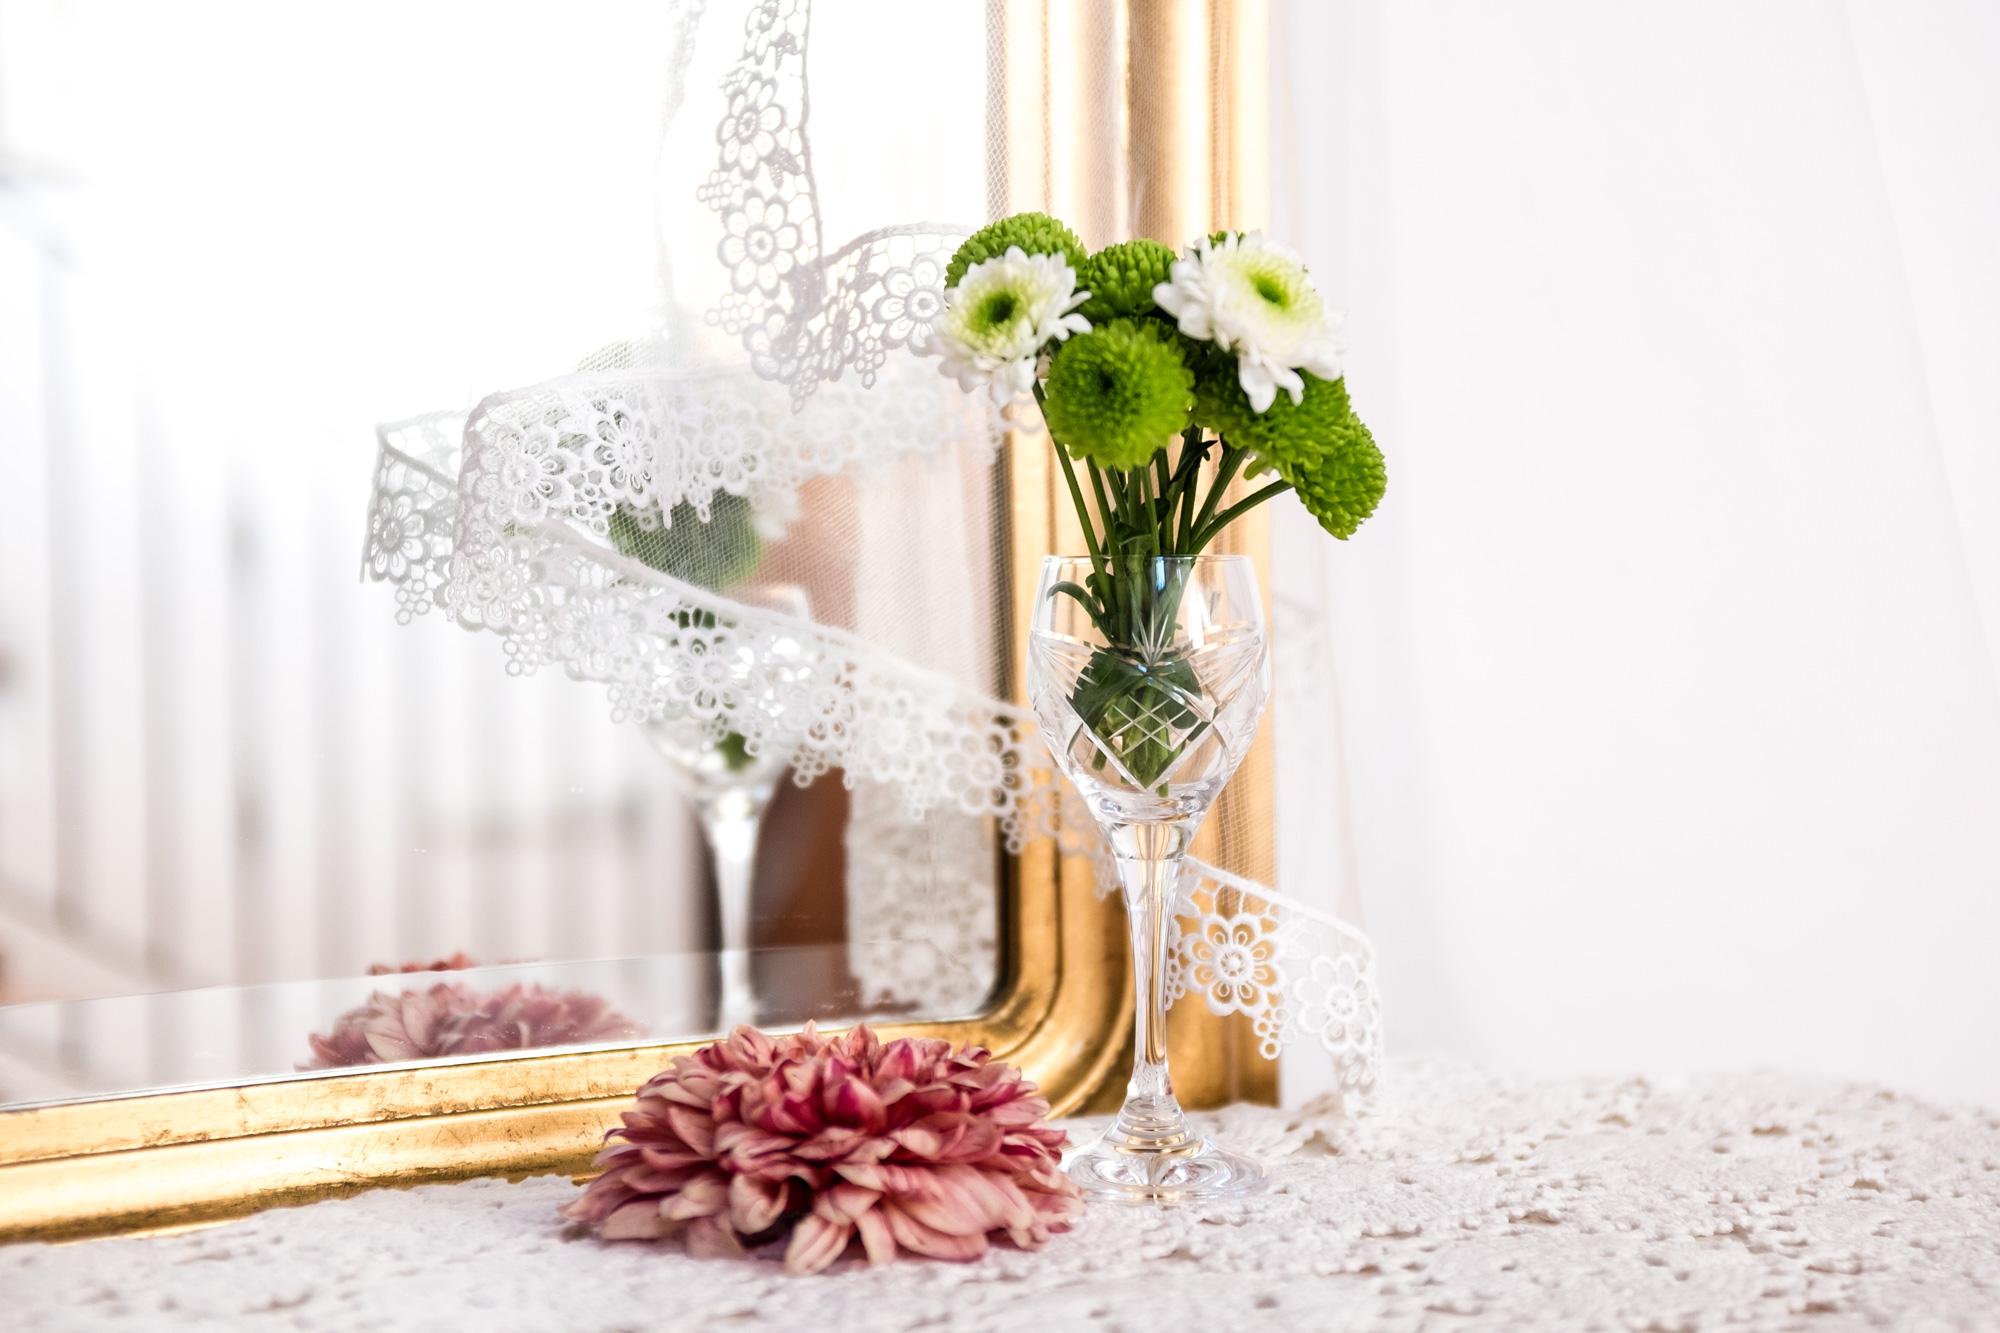 weddings - ibiza - events - party - best villa - love - wedding photo - video - event planner - couples - celebration